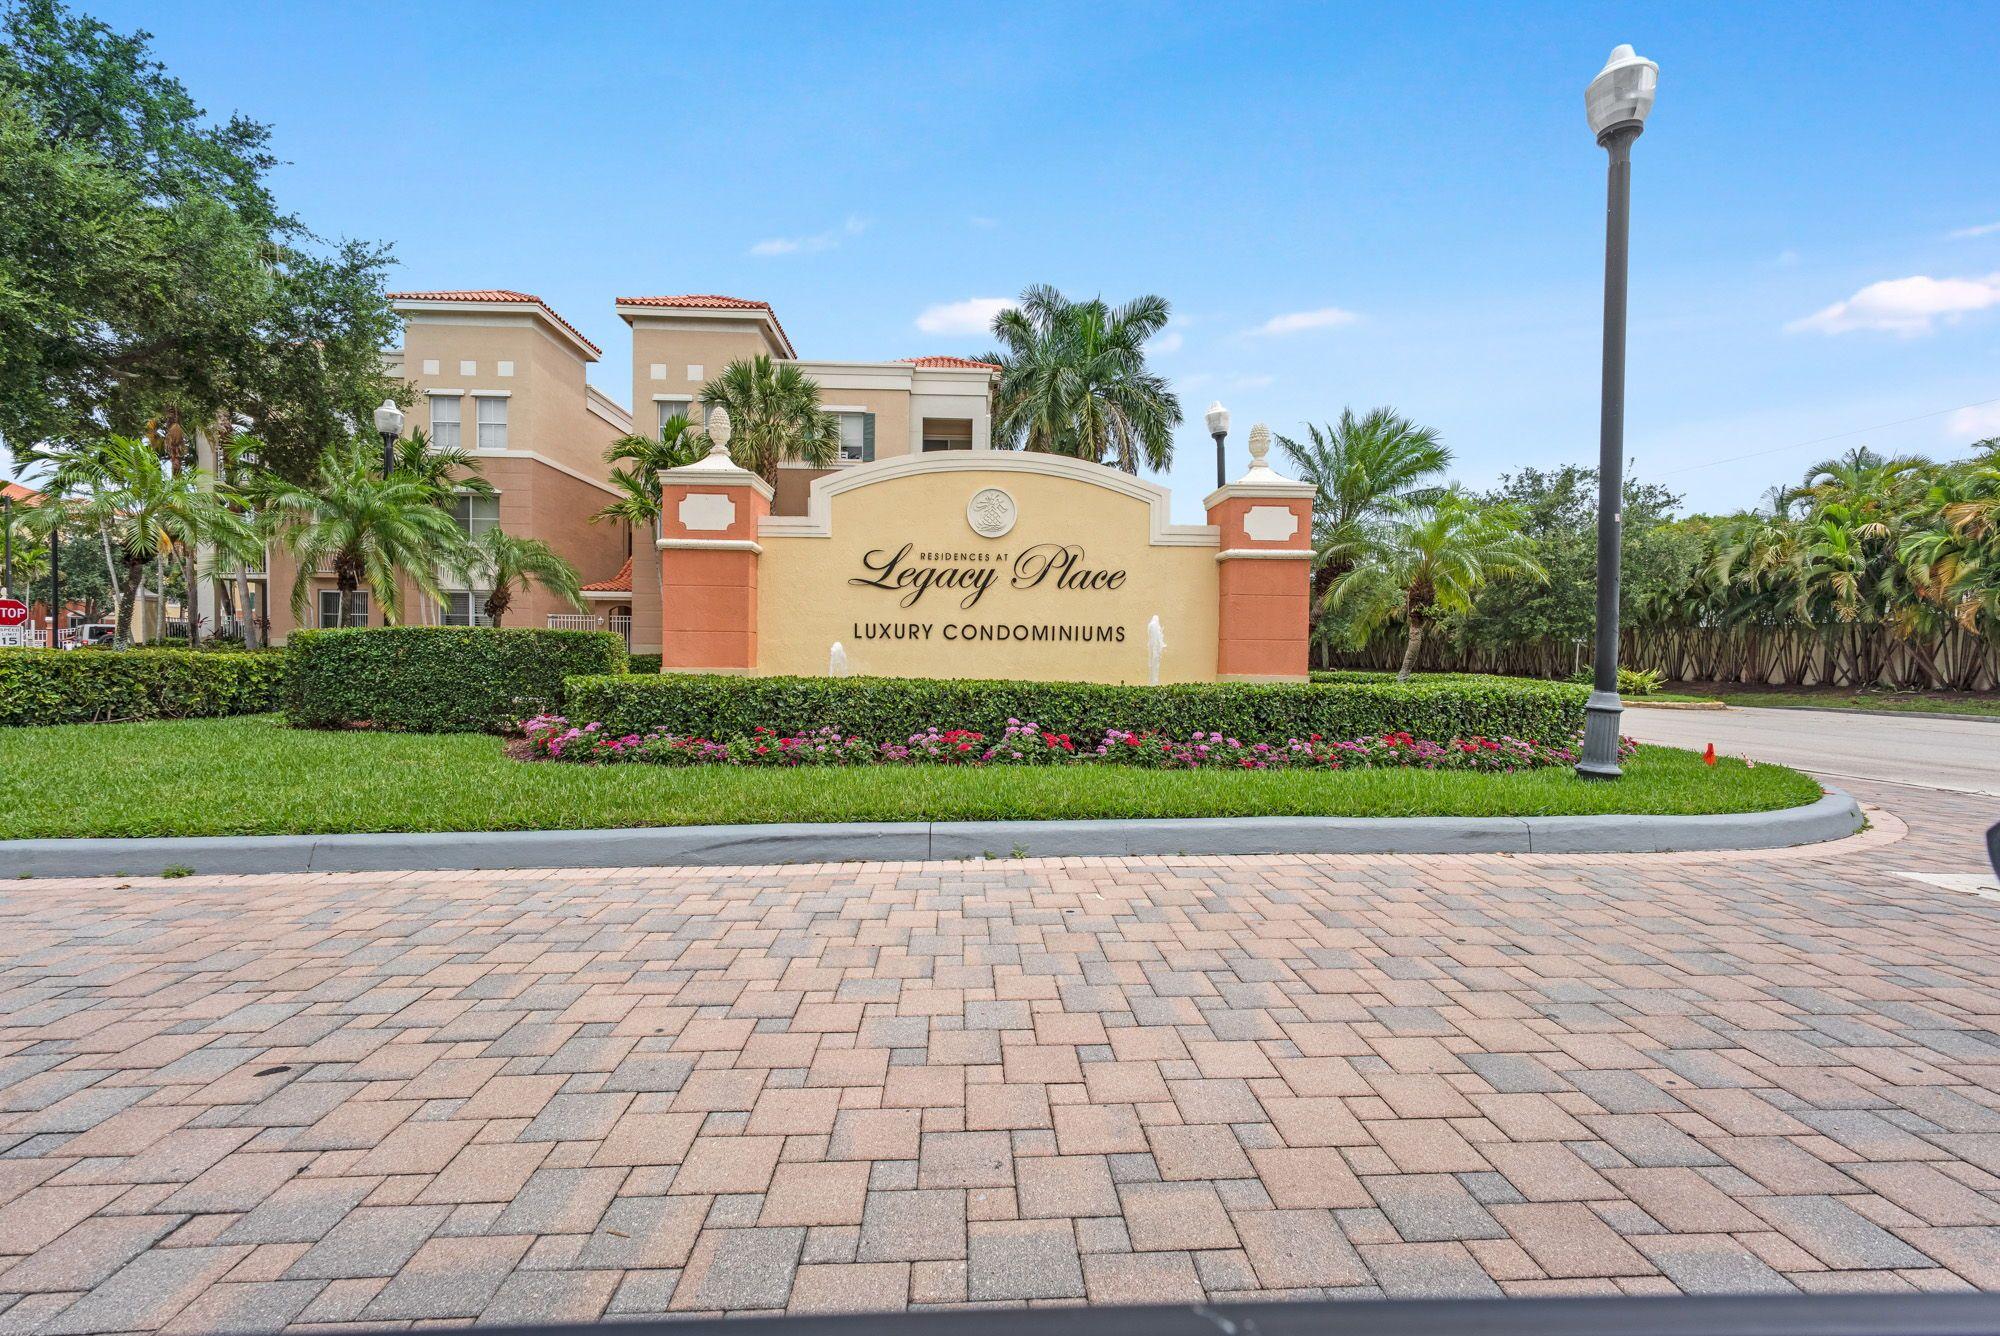 4595e7d2f1e3c33a269854d2e228dd1a - Legacy Place Condominiums Palm Beach Gardens